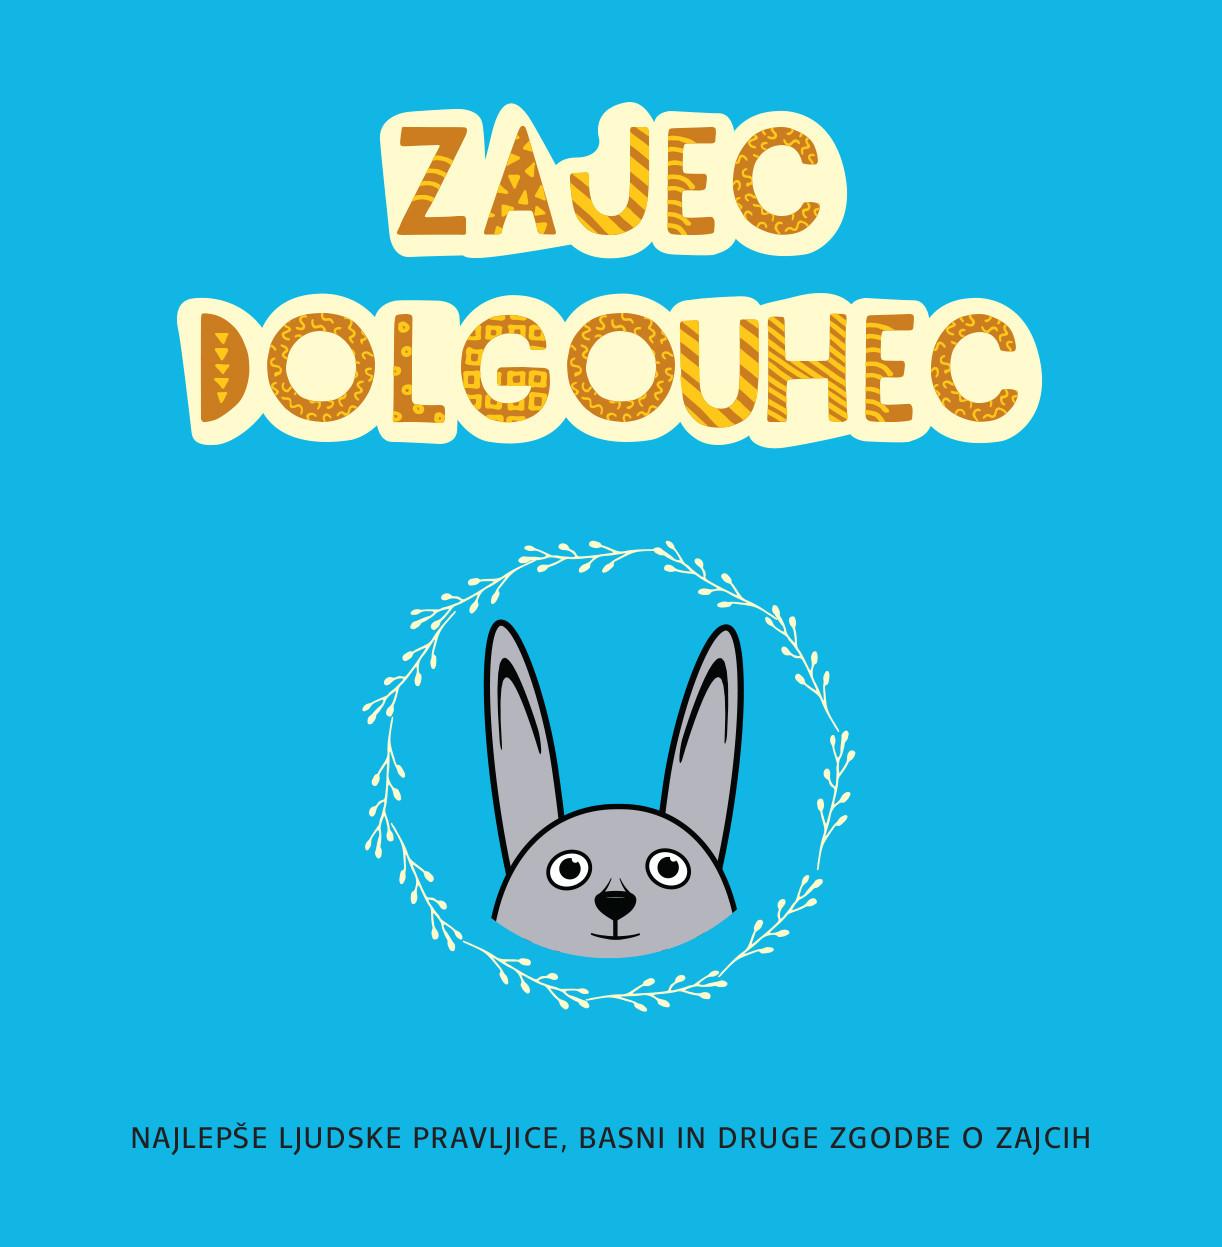 Zajec-Dolgouhec